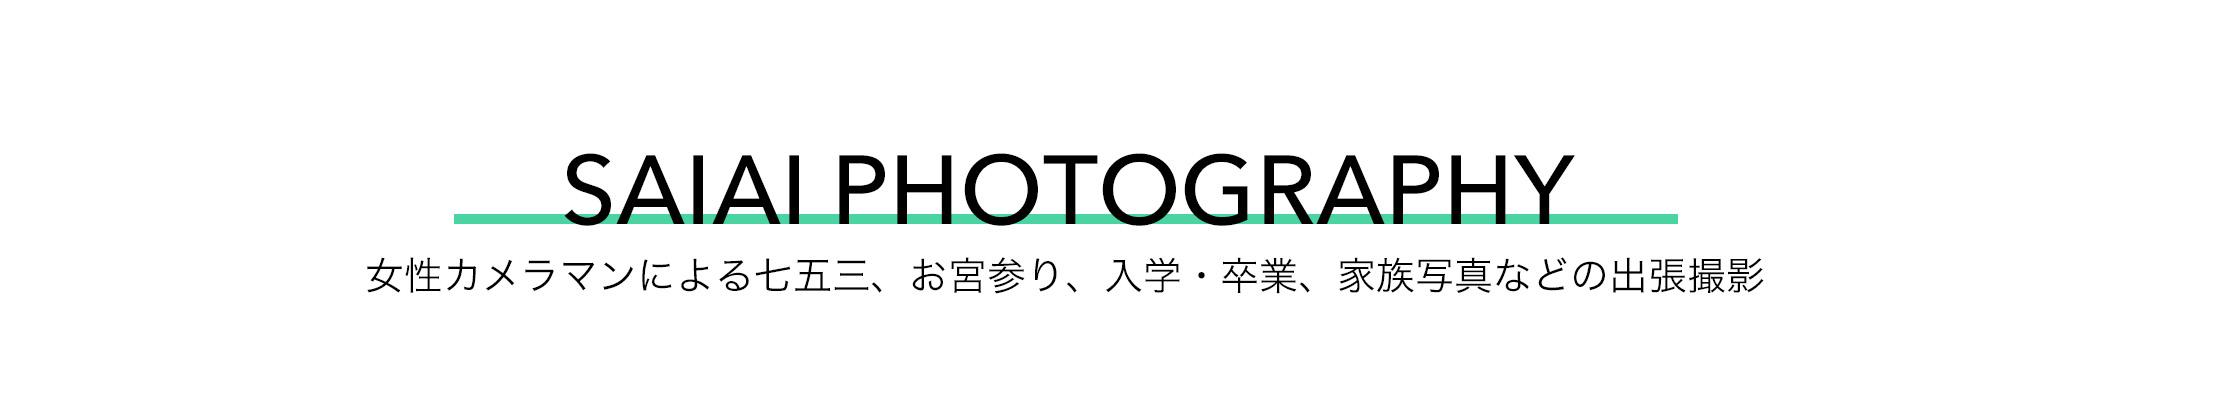 SAIAI PHOTOGRAPHY | 七五三、お宮参り、新生児フォトの出張撮影